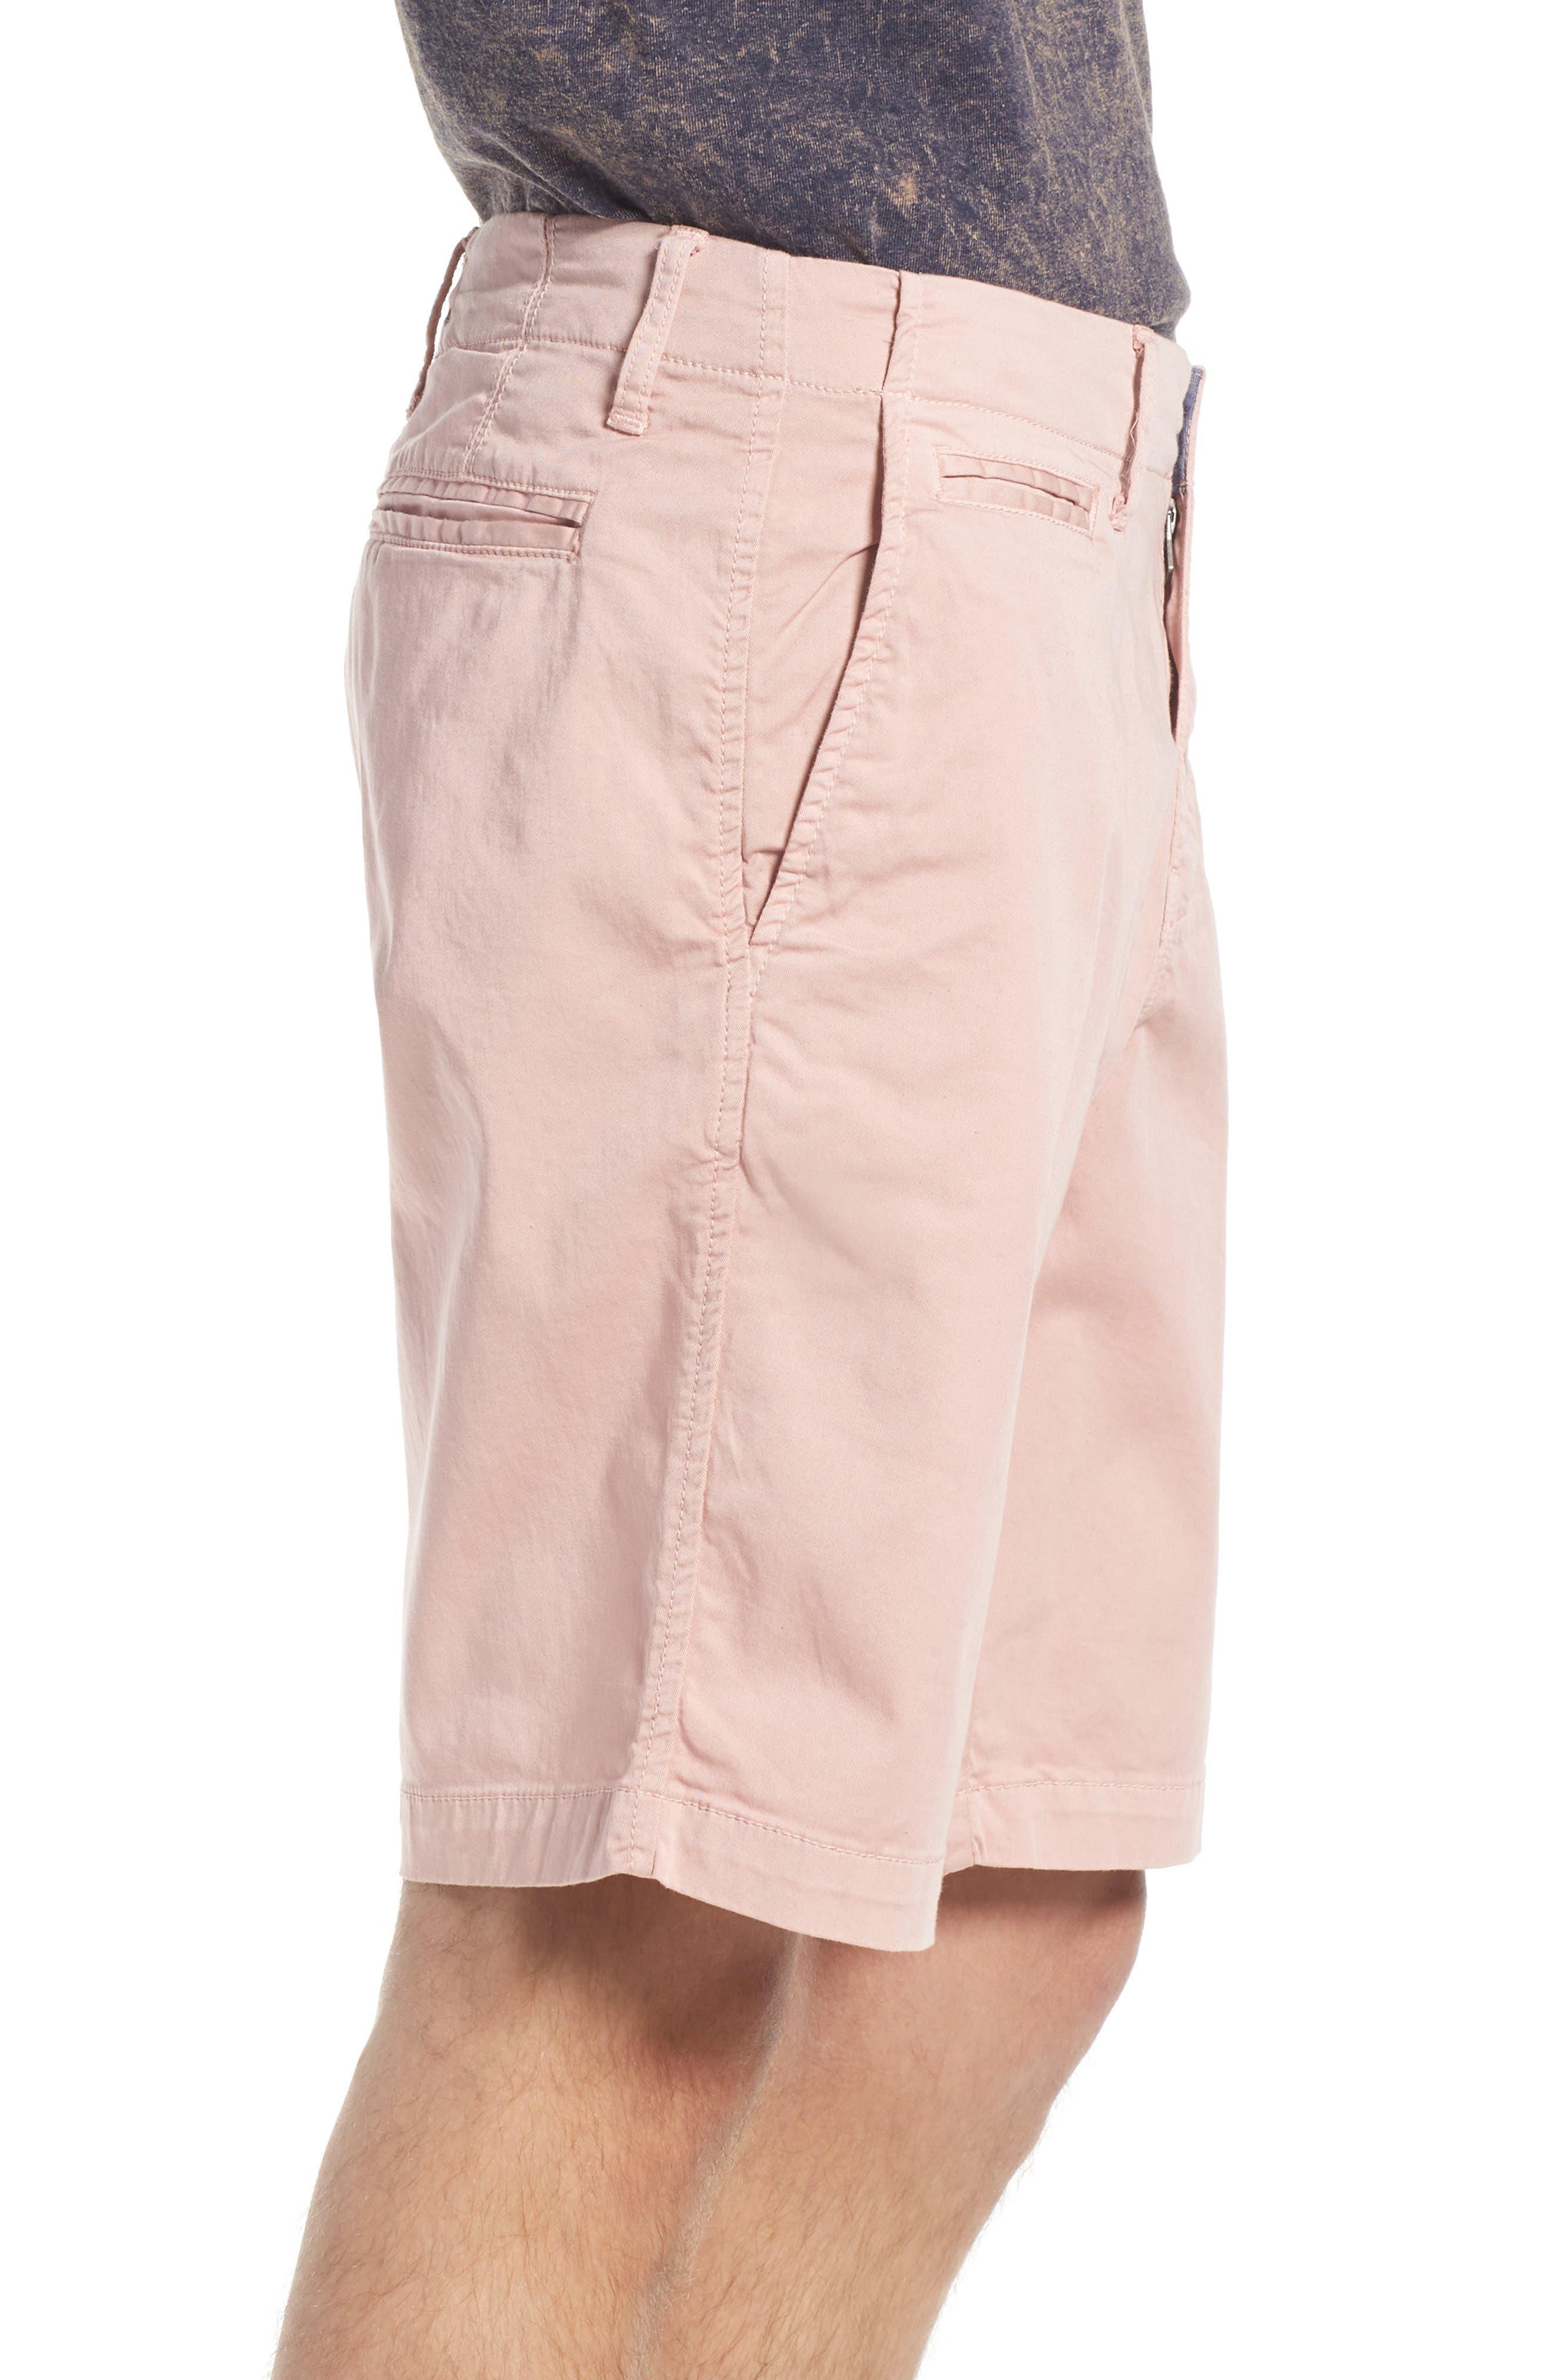 St. Barts Twill Shorts,                             Alternate thumbnail 35, color,